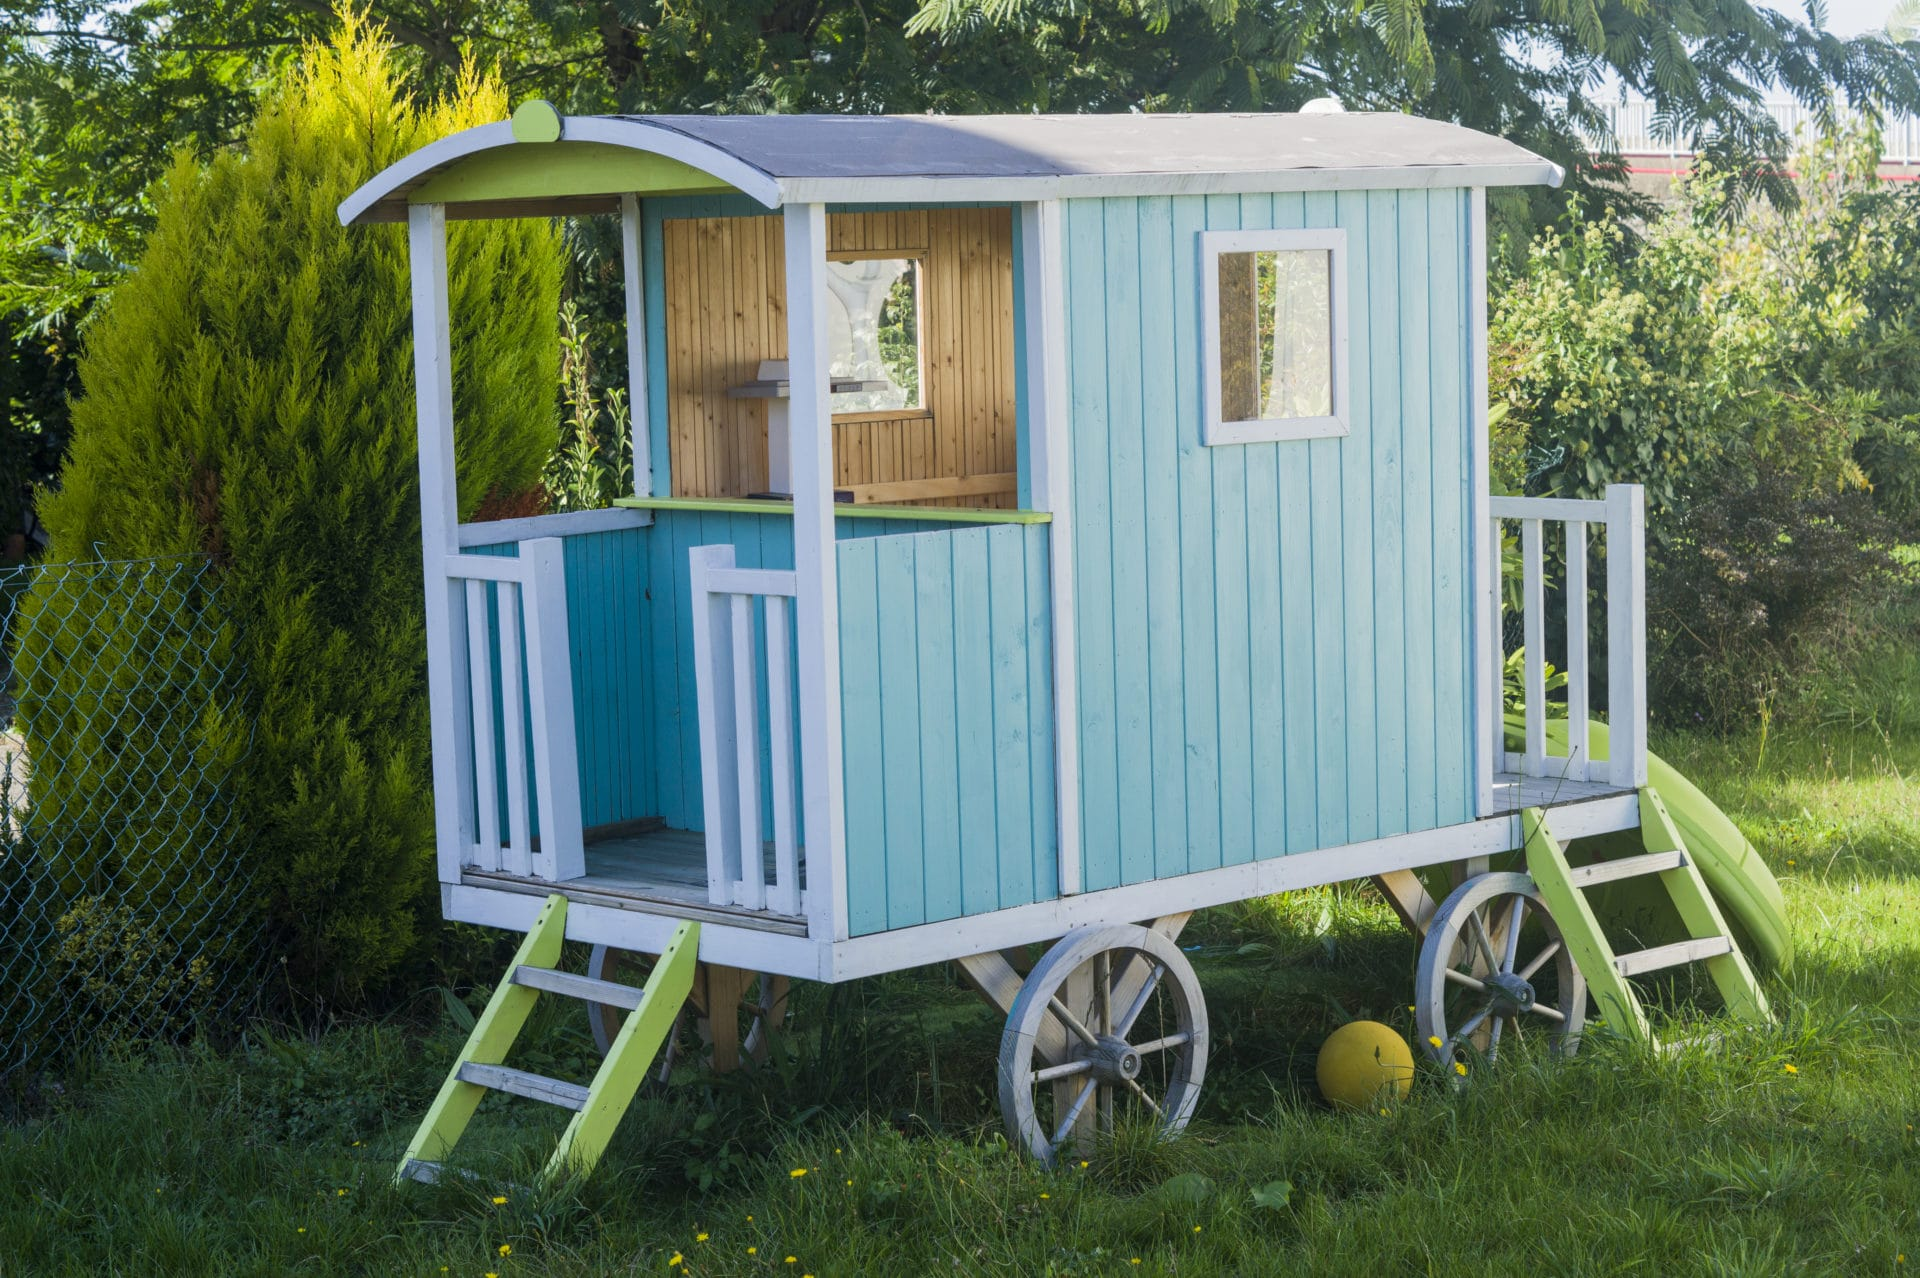 Cabane en bois pour enfant cabane jardin enfant acheter - Cabane de jardin en bois pour enfants ...